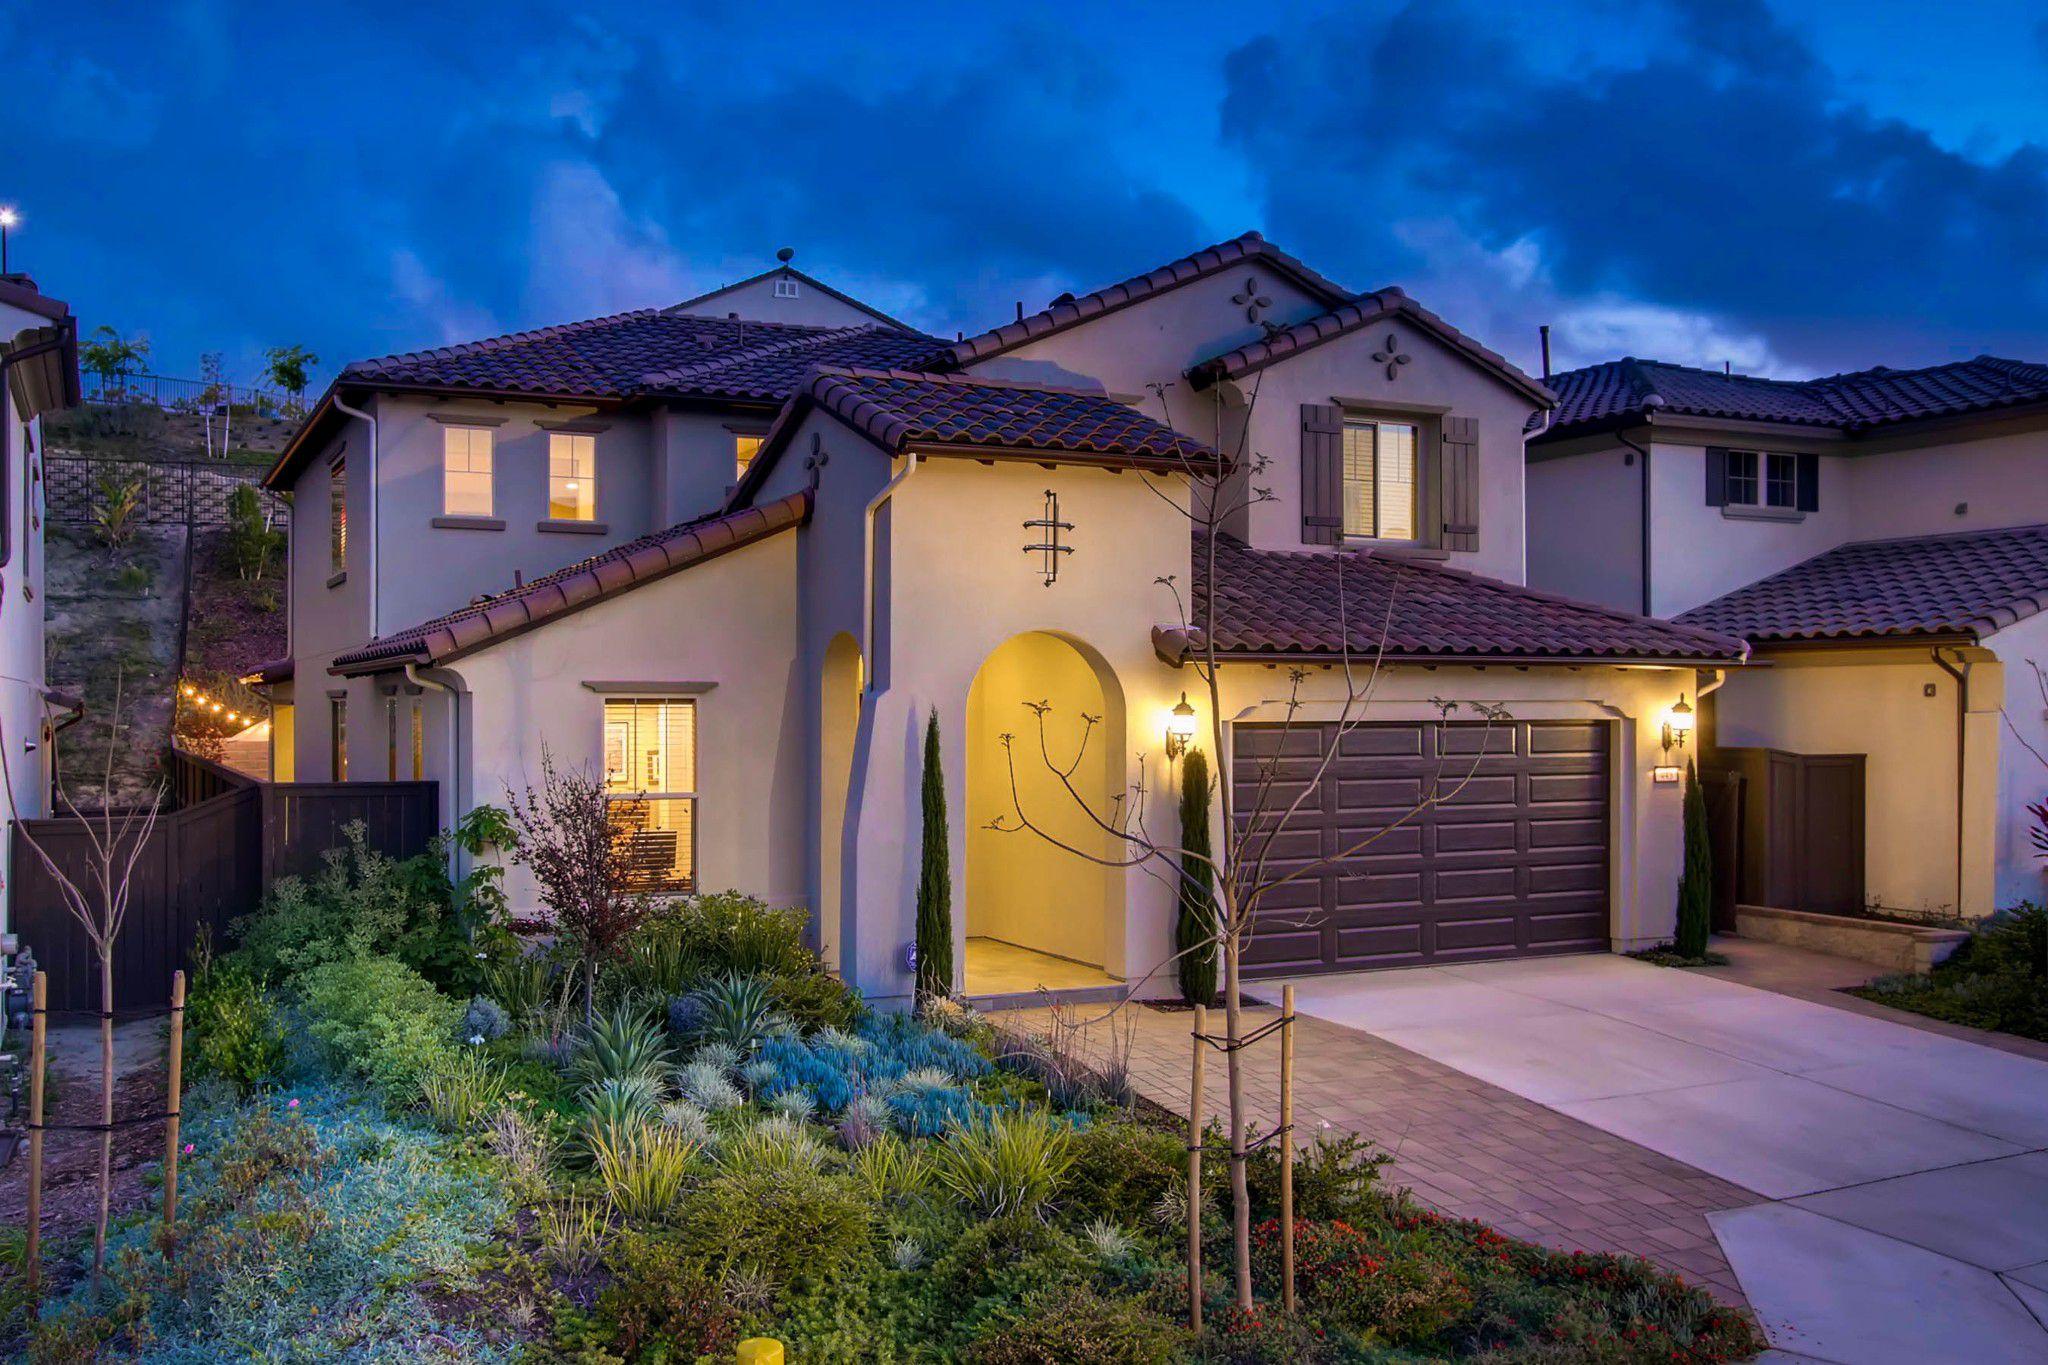 Main Photo: Residential for sale : 5 bedrooms : 443 Machado Way in Vista